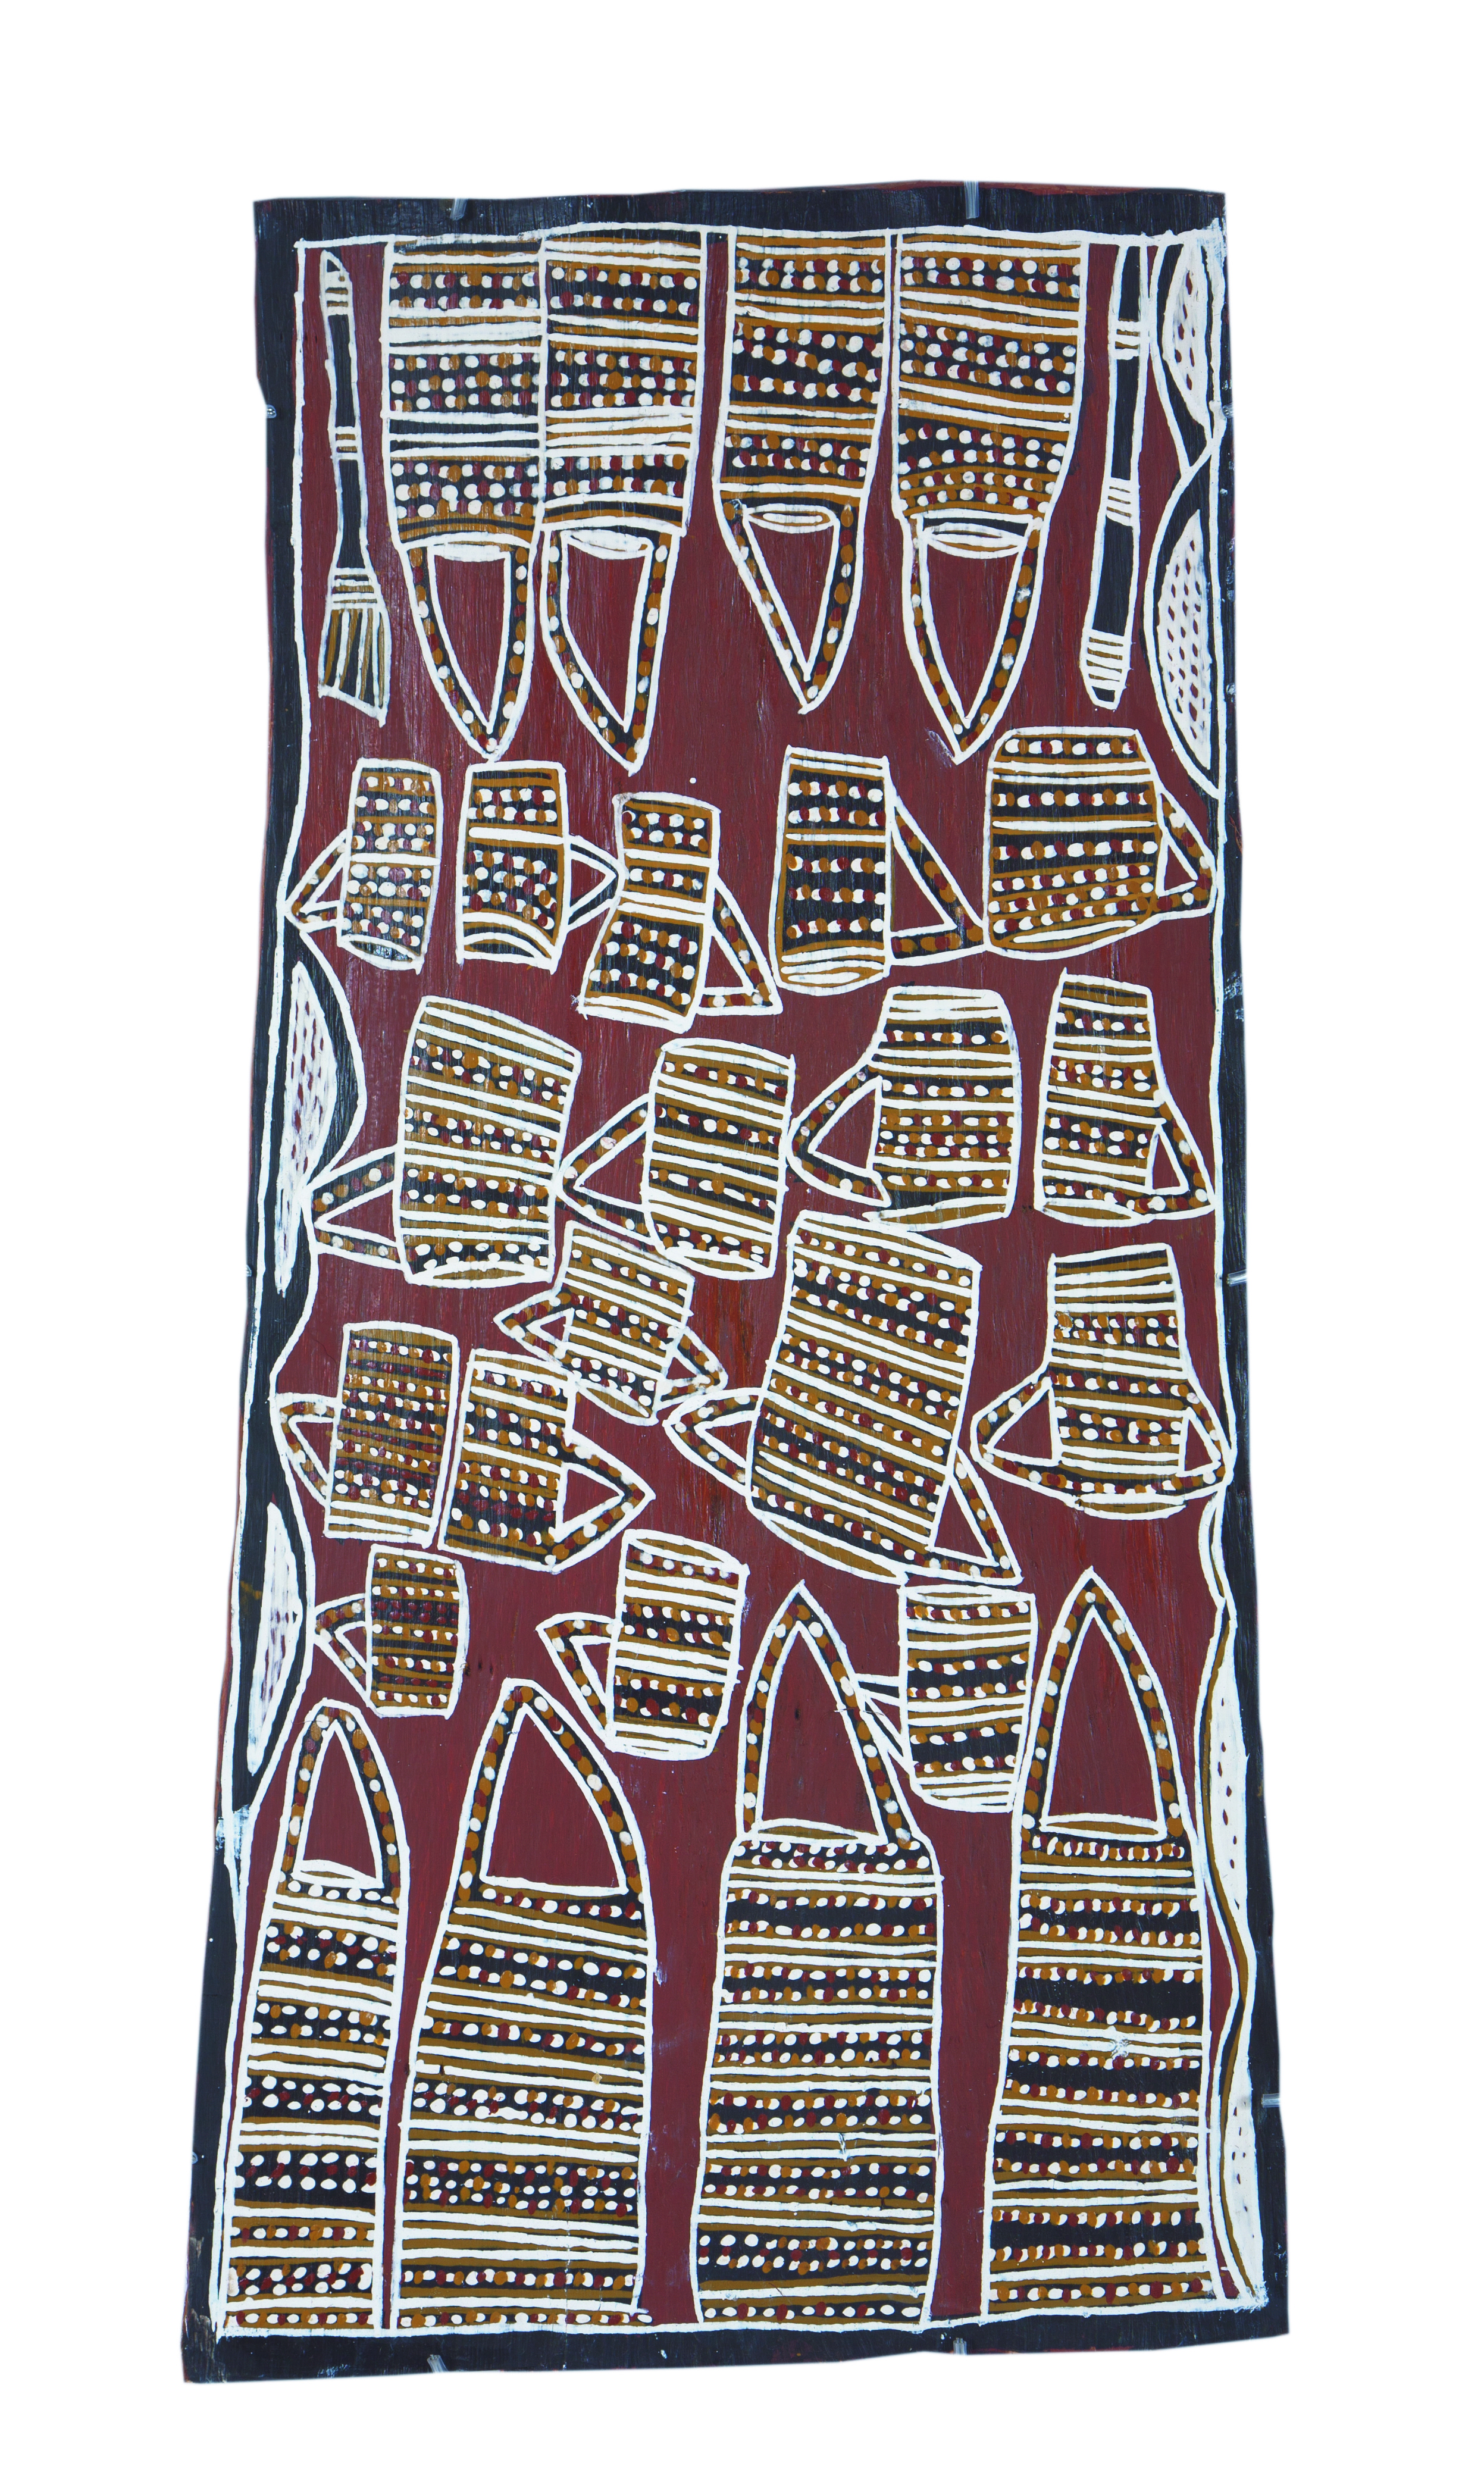 Nonggirrnga Marawili  Dilly Bags & Teacups  Natural earth pigments on bark 85 x 44cm  Buku Larrnggay Mulka #4182C   EMAIL INQUIRY